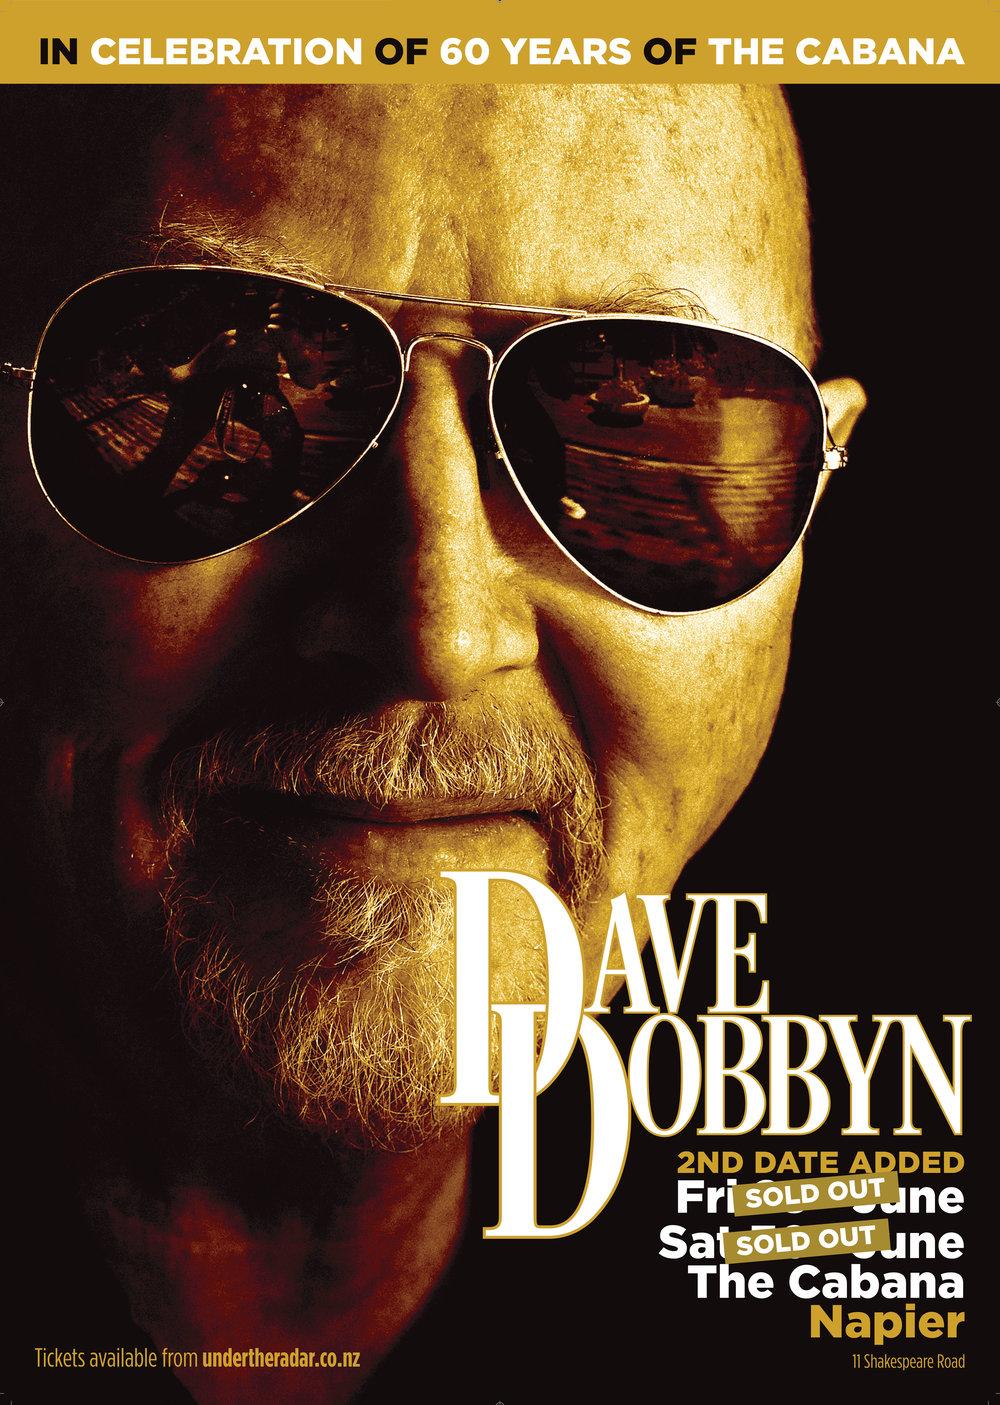 DAVE DOBBYN JNAPIER 2018 - 2 SOLD OUT.jpg